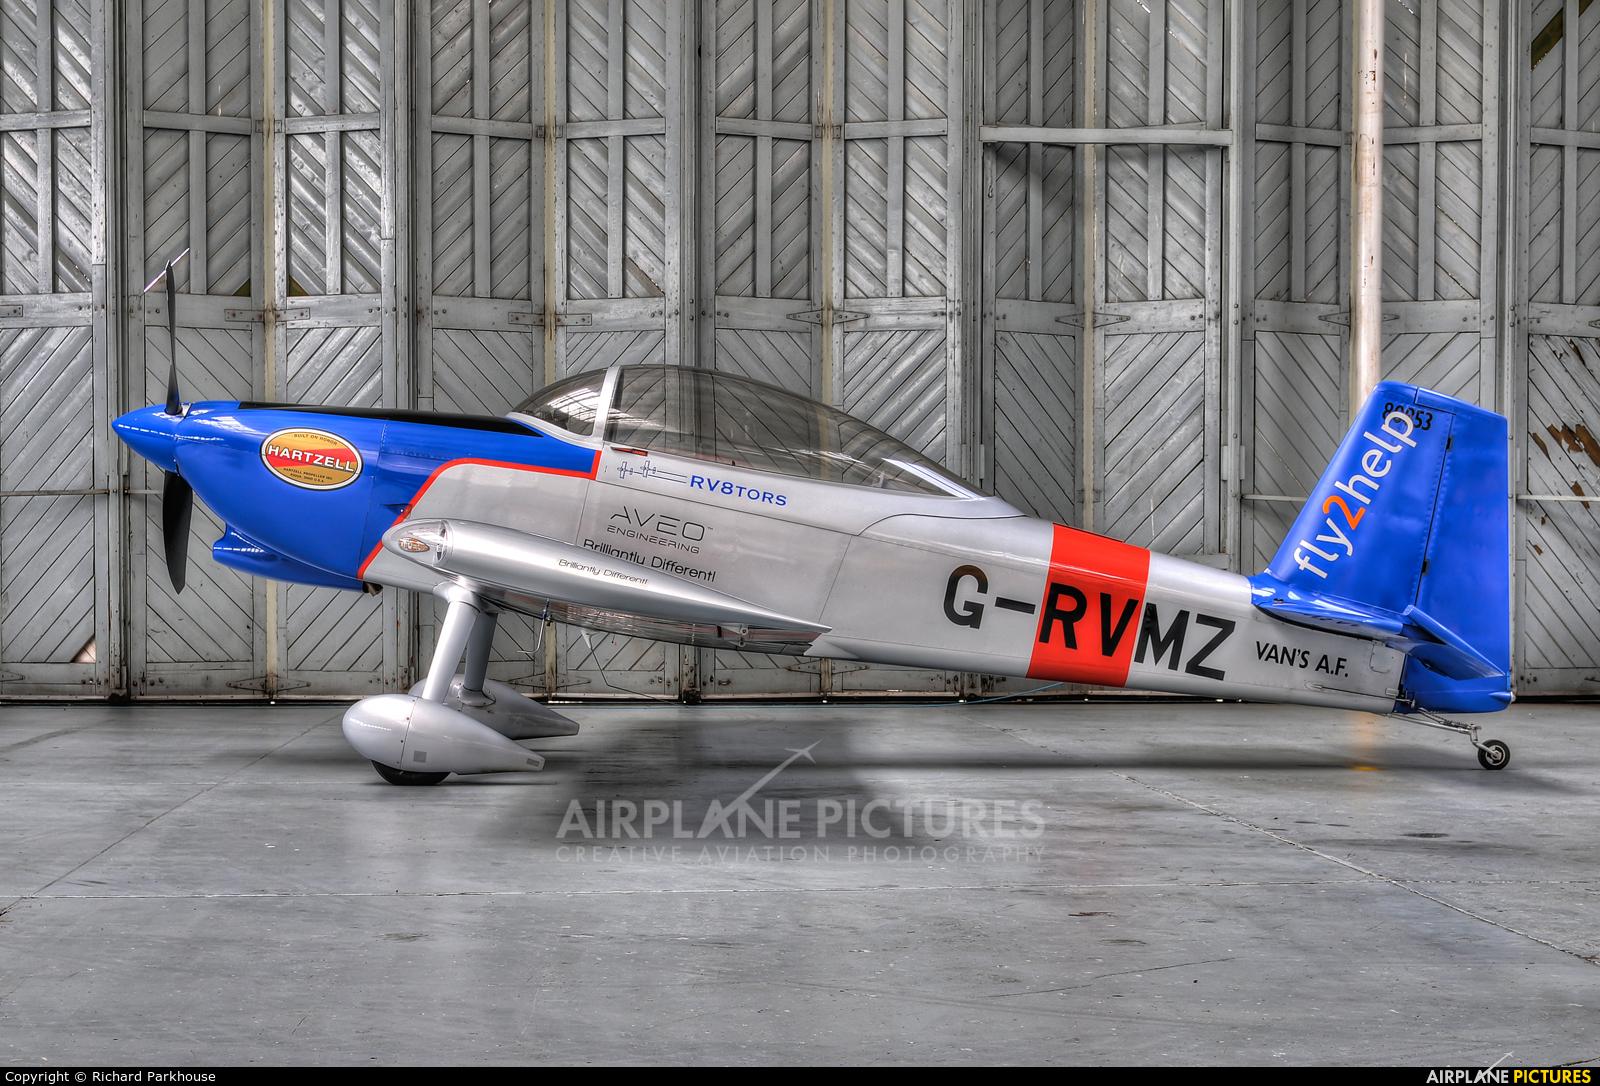 Private G-RVMZ aircraft at Duxford